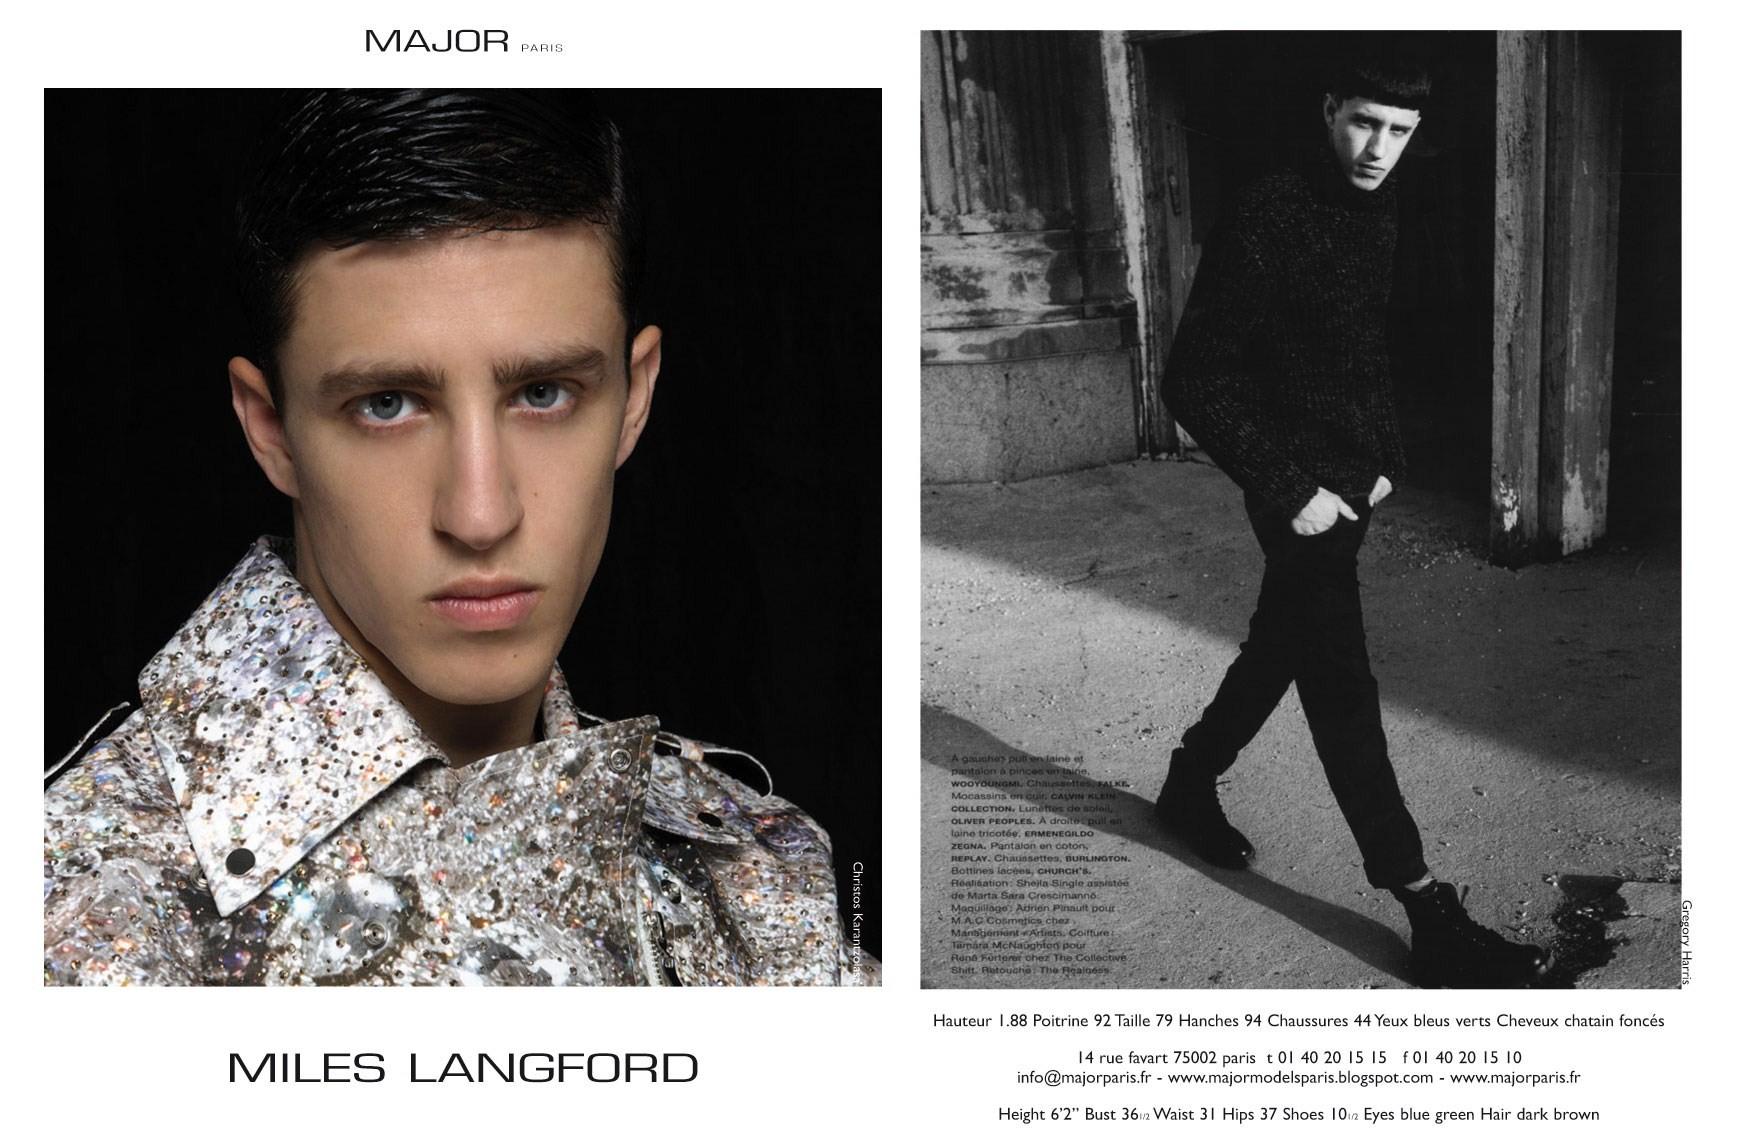 Major Paris Fall/Winter 2013 Show Package | Paris Fashion Week image